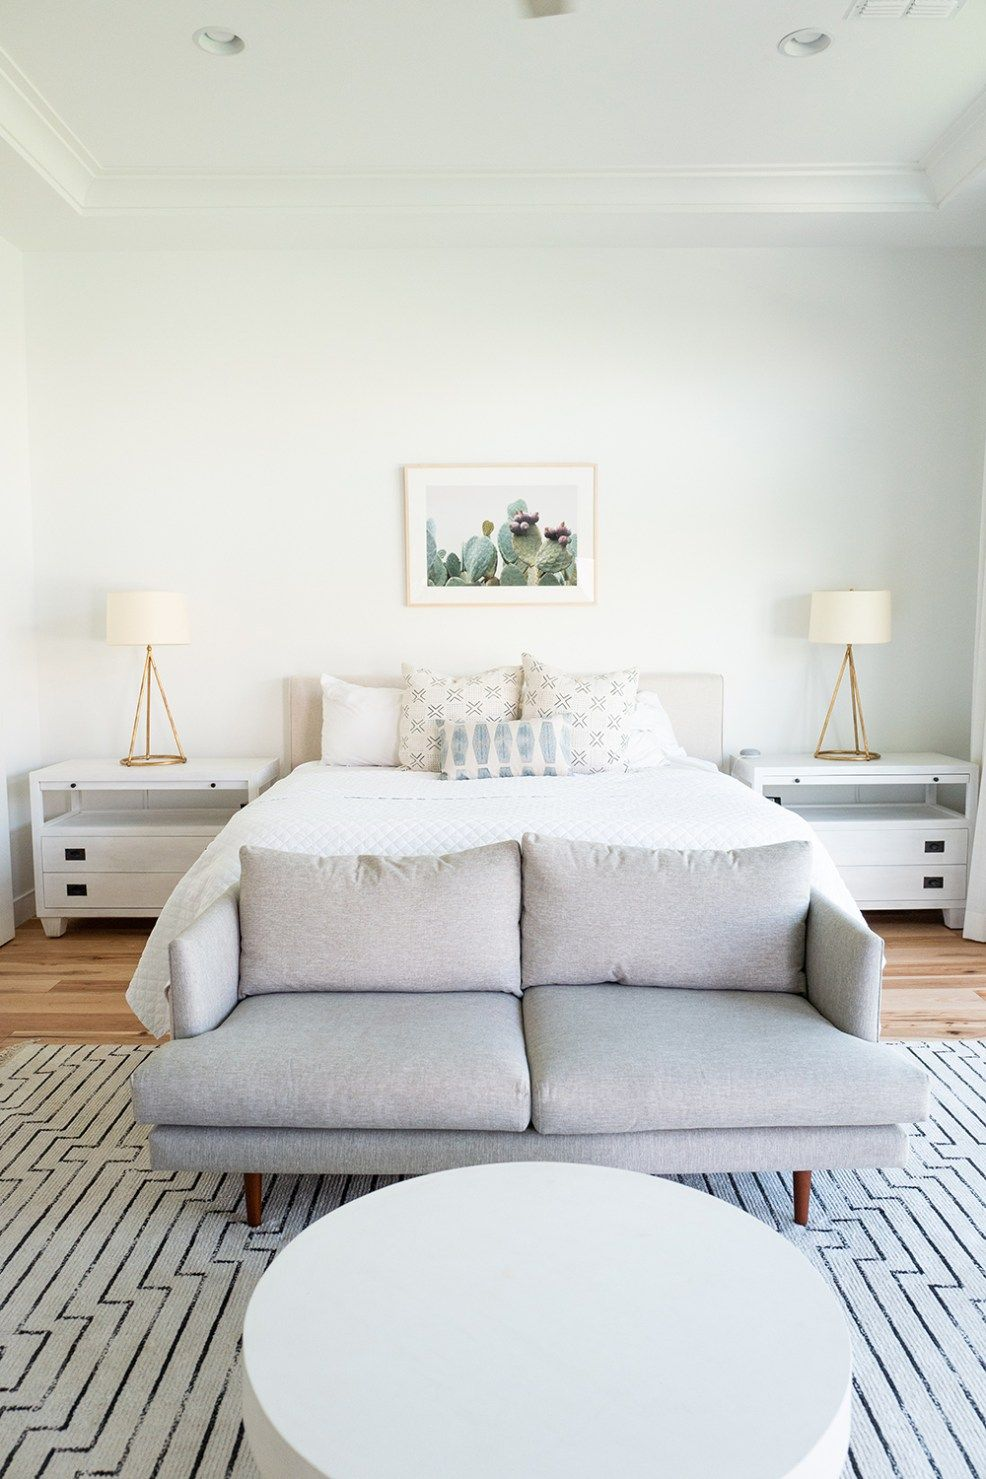 Morrisonwhiteproject popular interior design blog e interiors